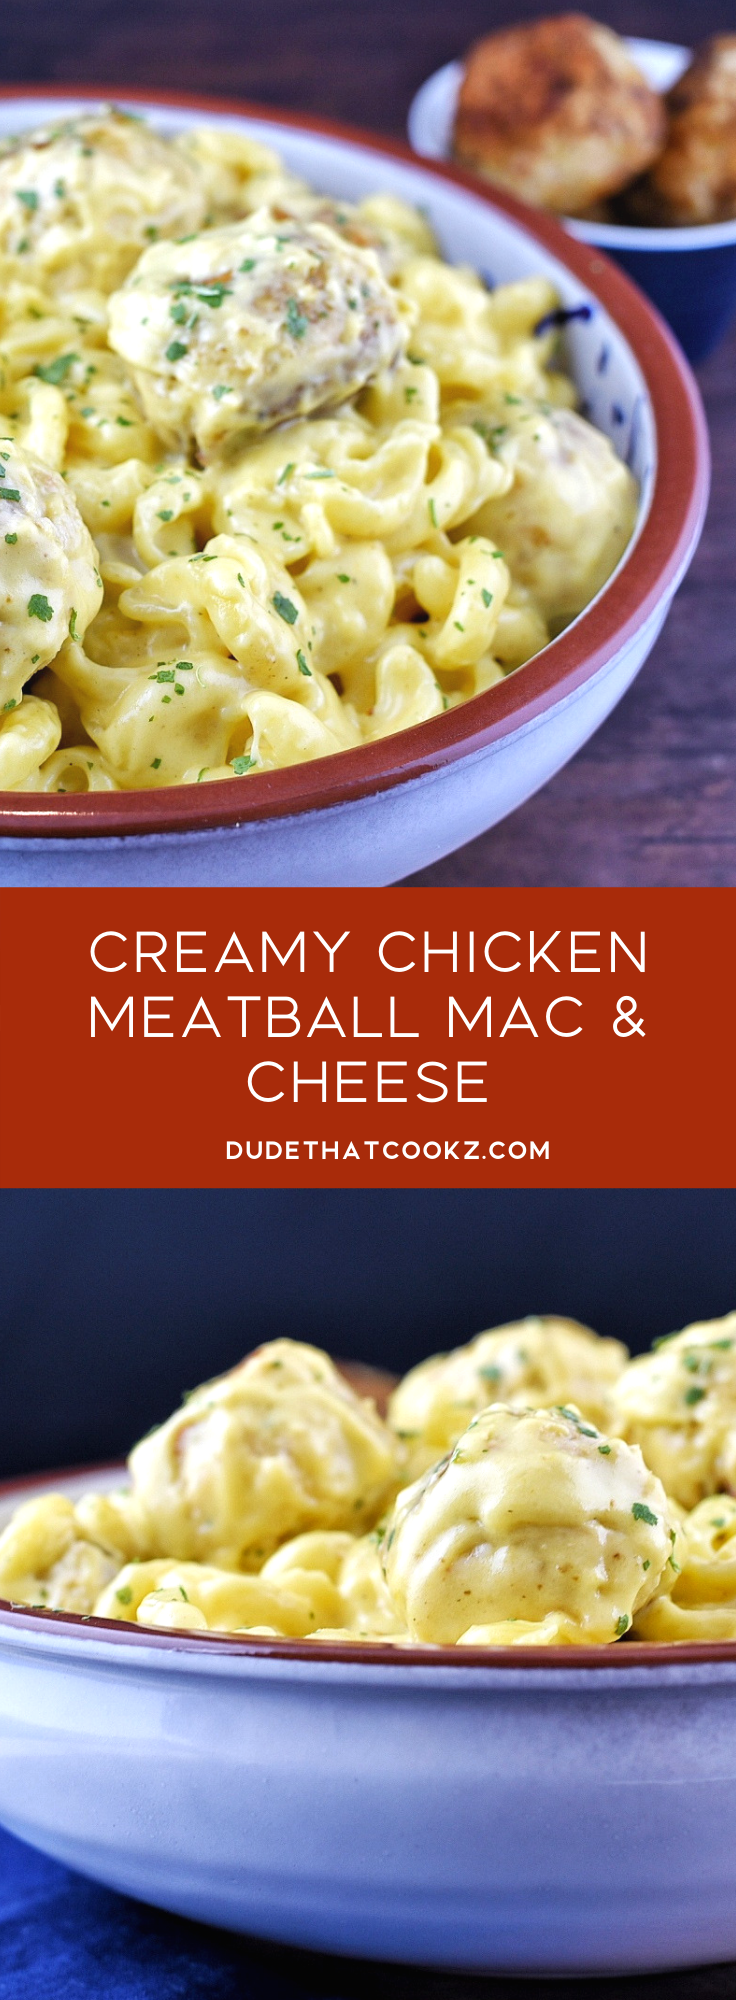 Creamy Chicken Meatball Mac & Cheese